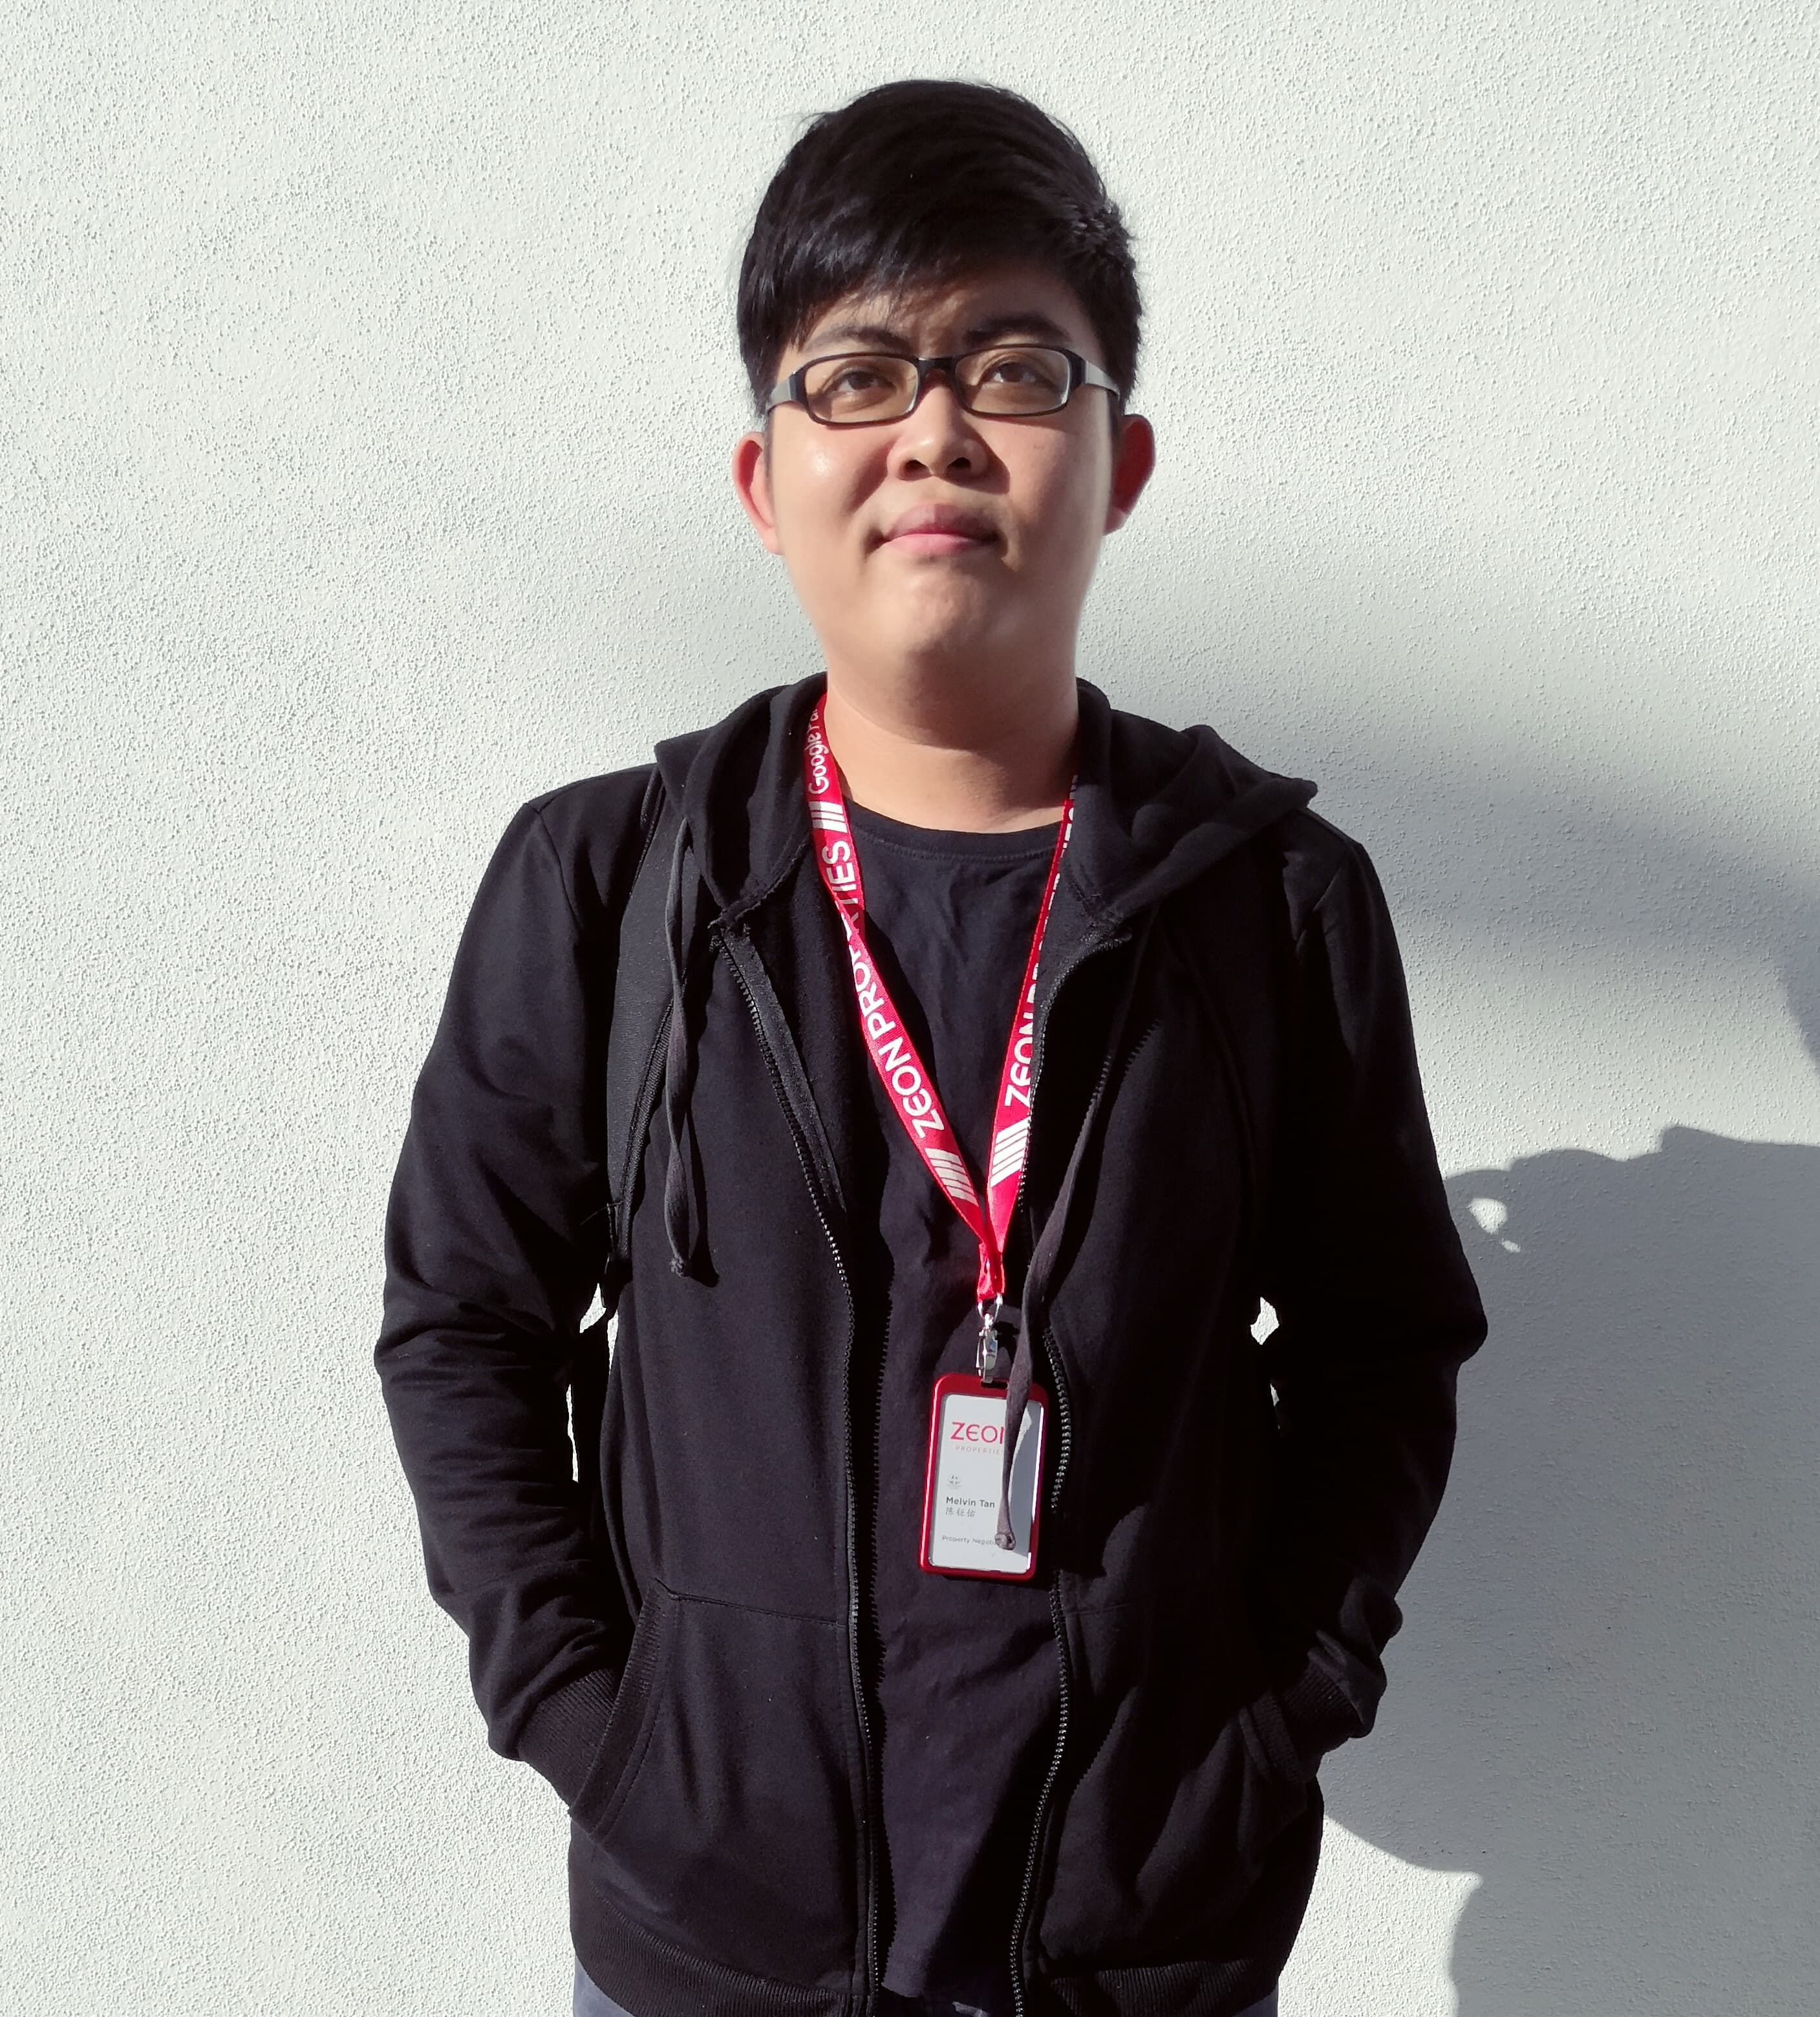 Melvin Tan Jie You